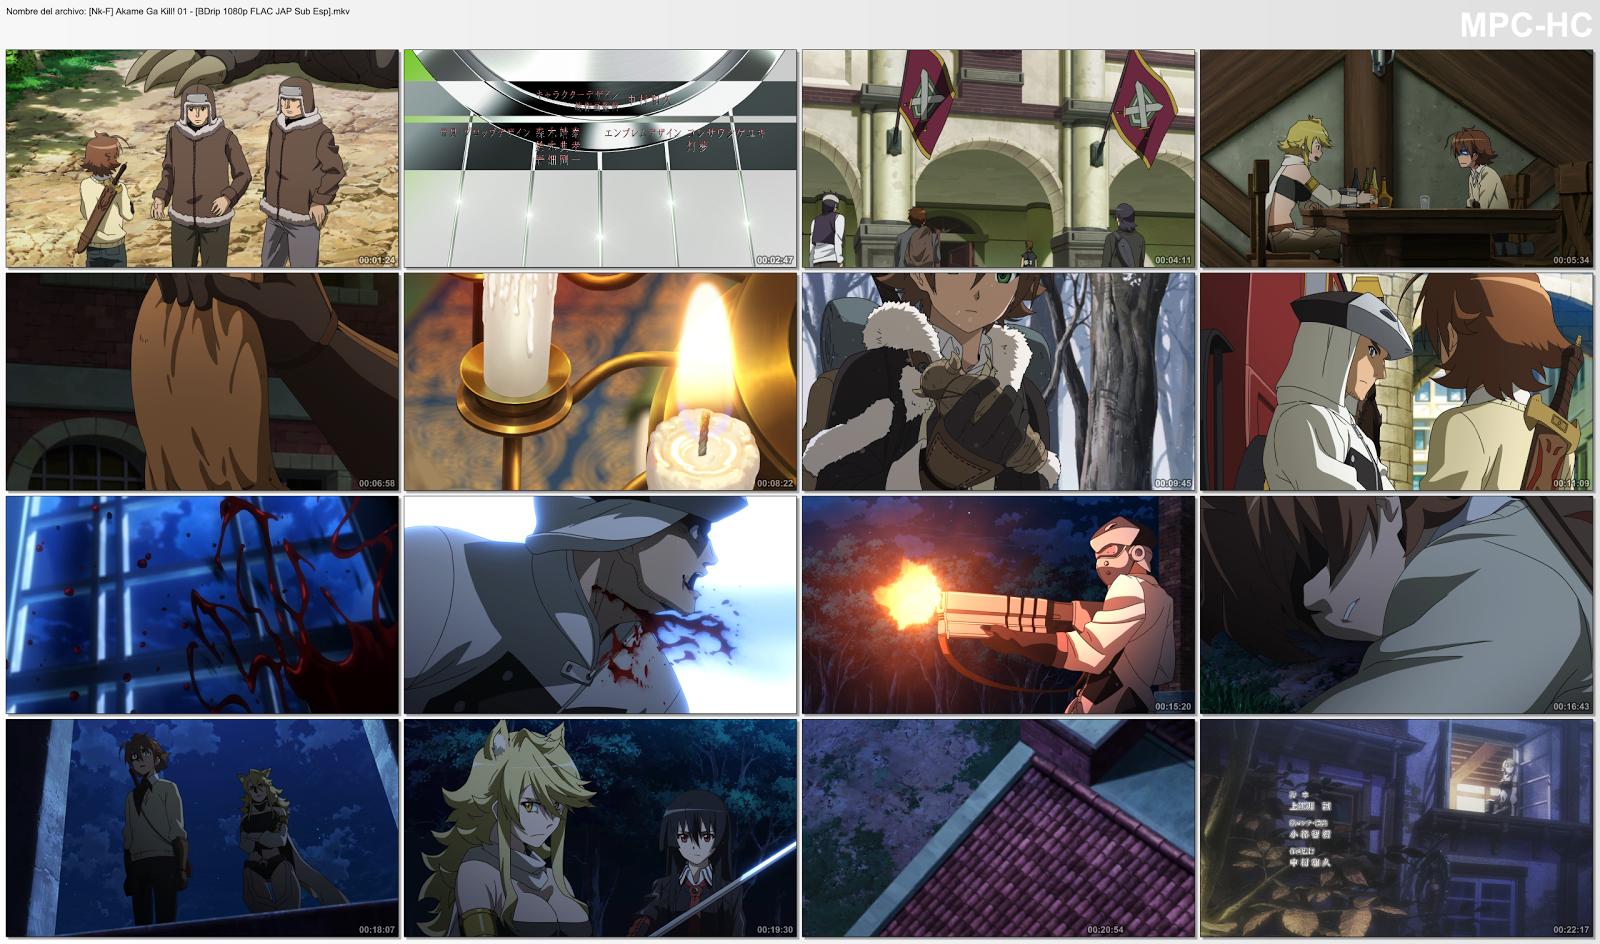 Anime-TéConPastas ([Nk-F] Akame Ga Kill! 1080 Japonés VOSE SubESP MKV)